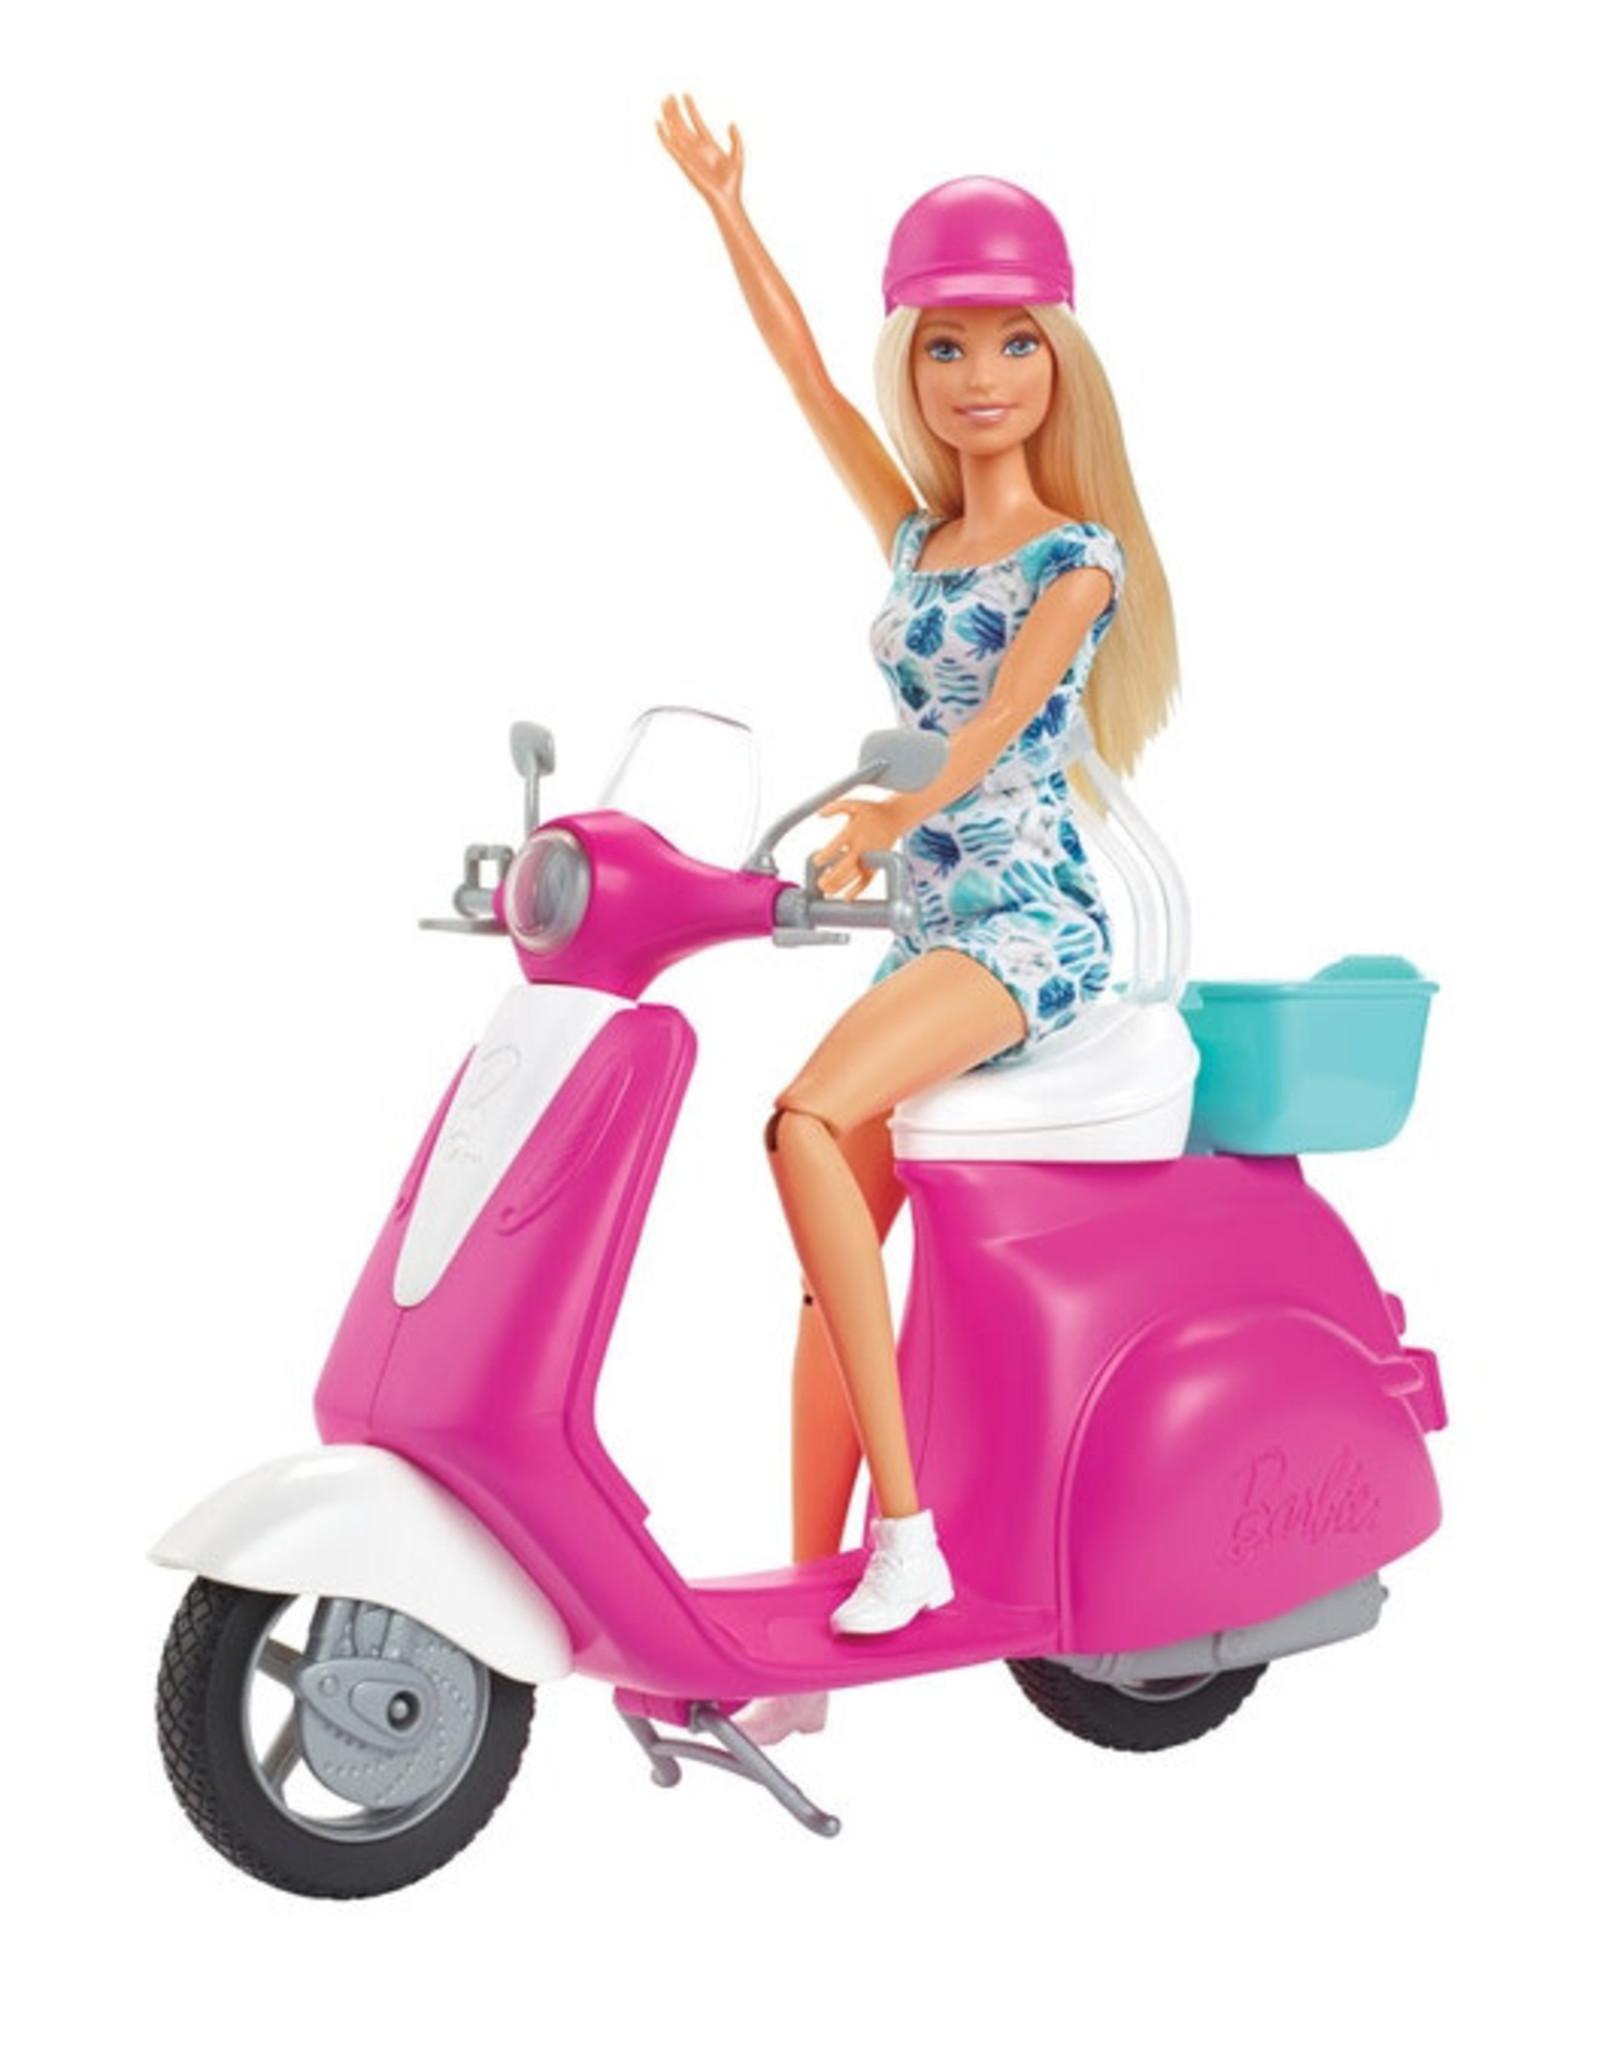 Barbie Barbie Doll & Scooter